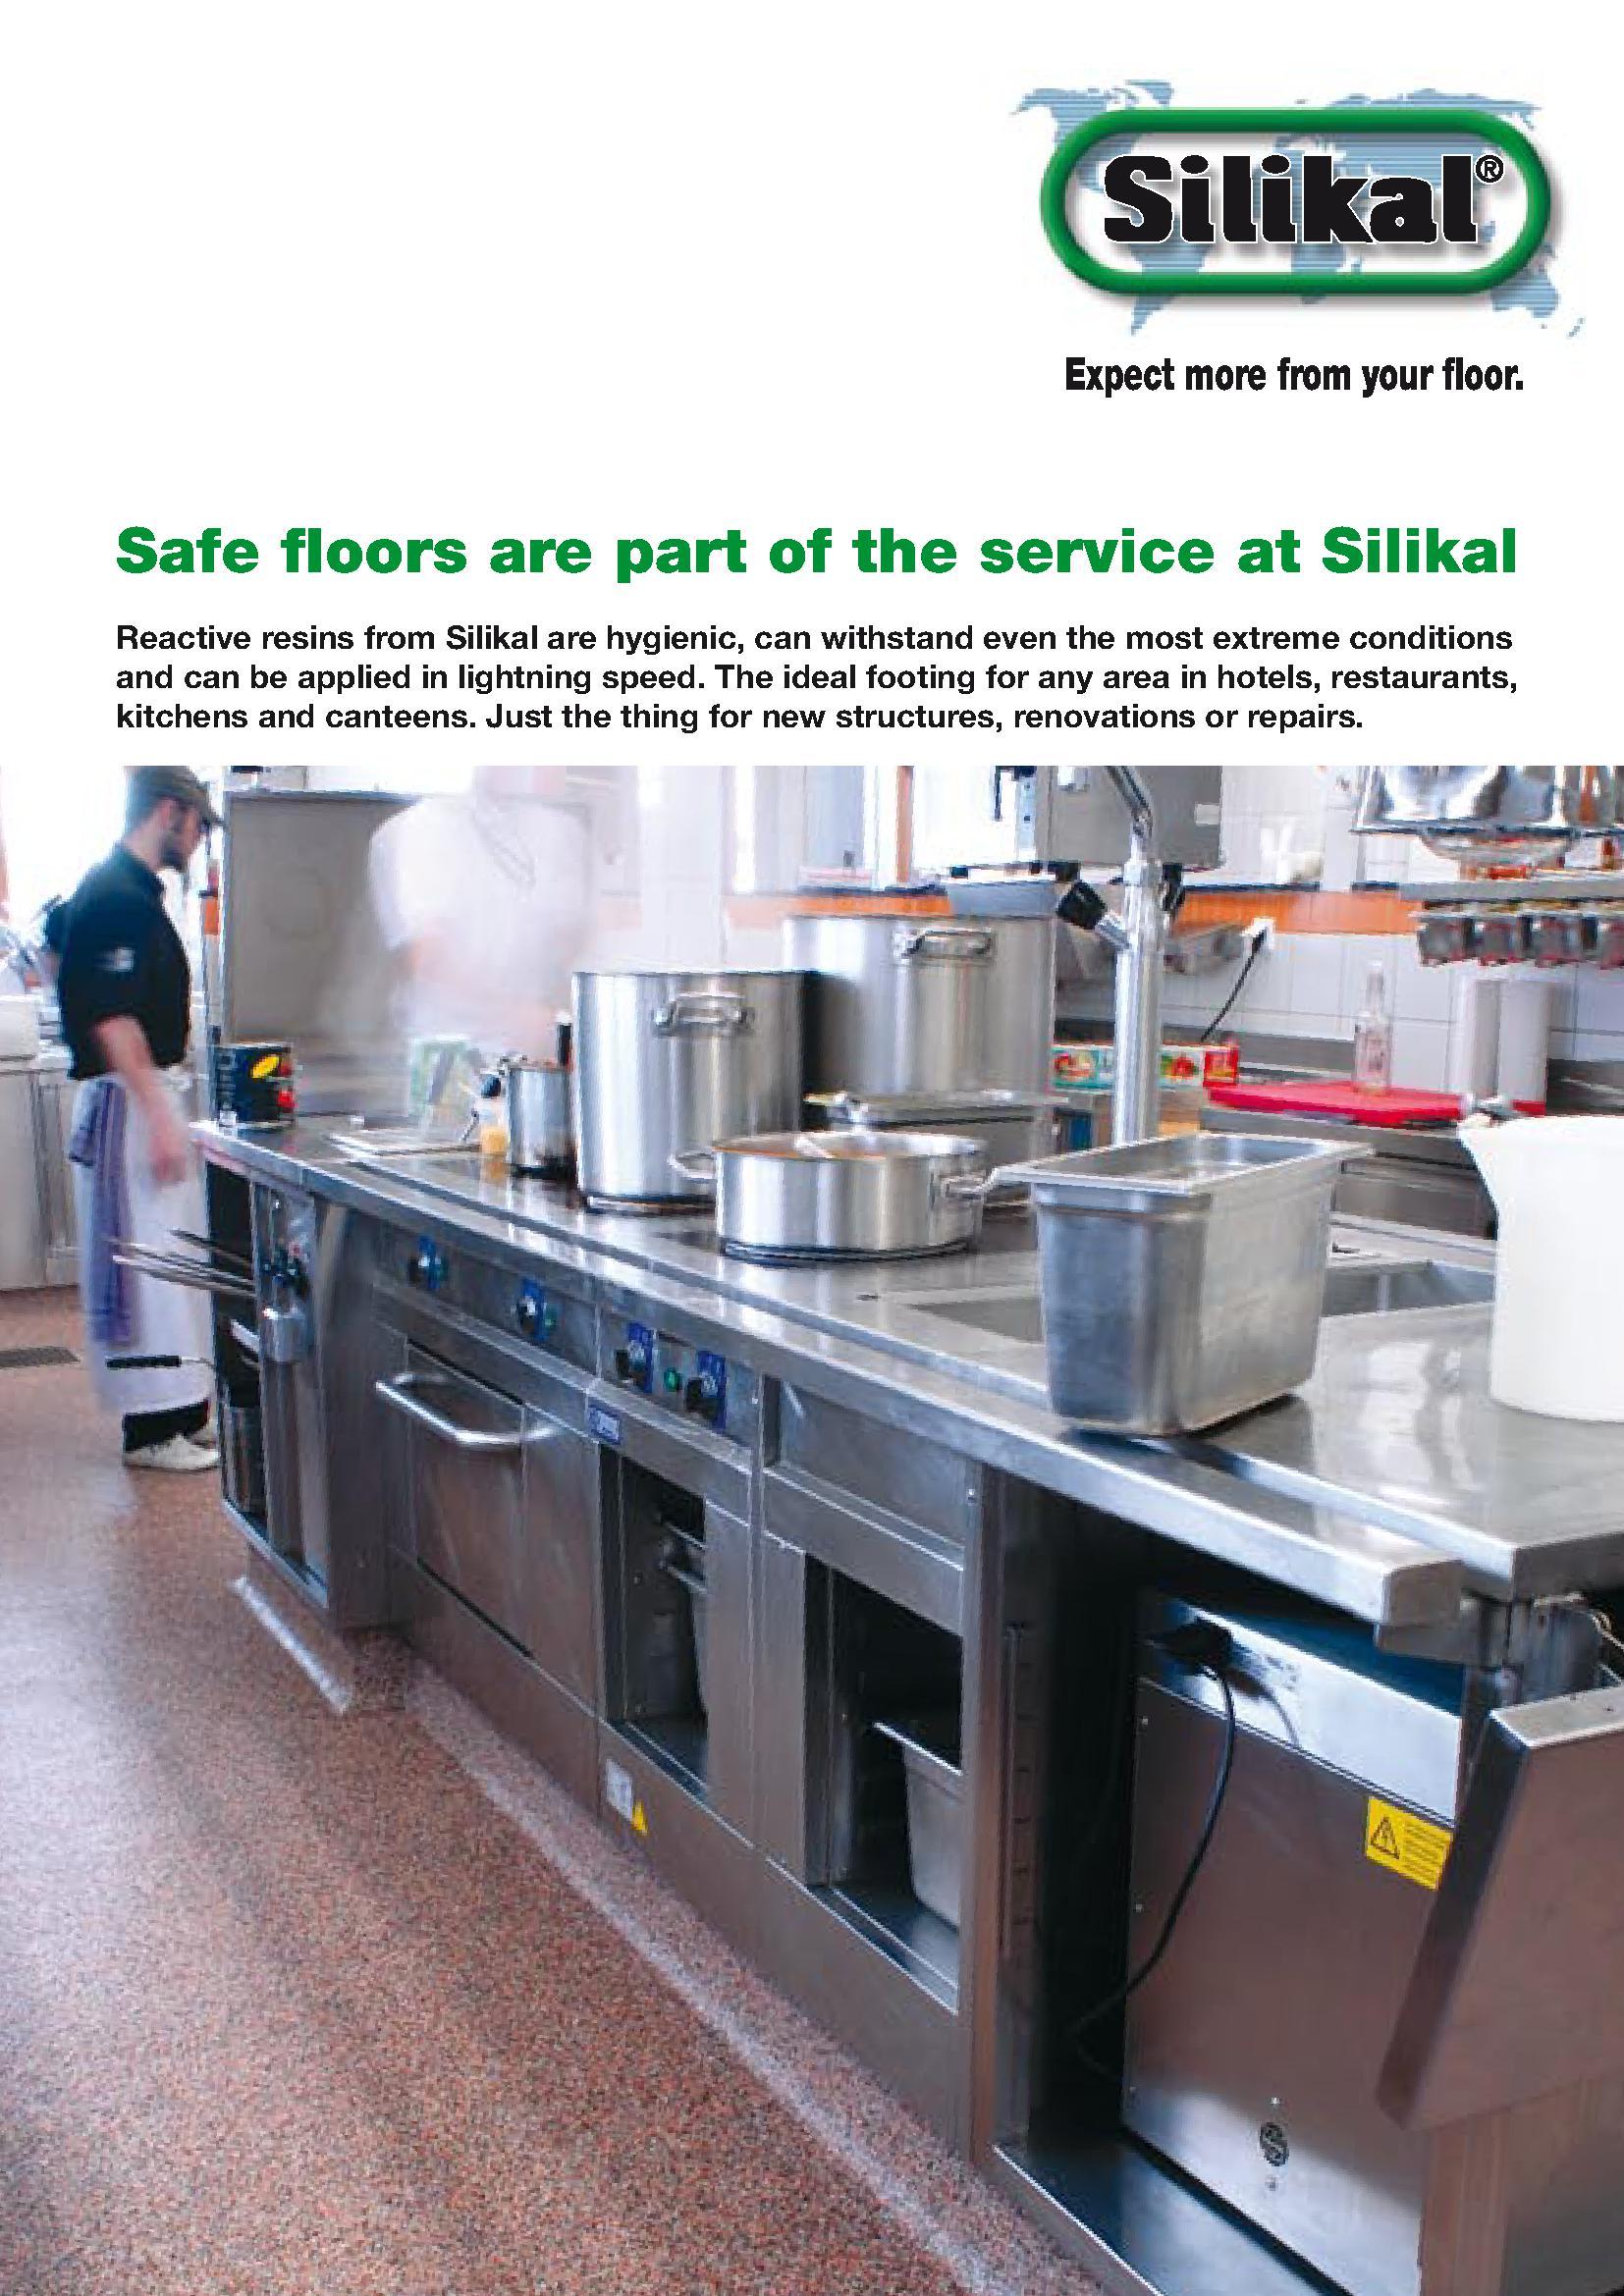 silikal flooring kitchens